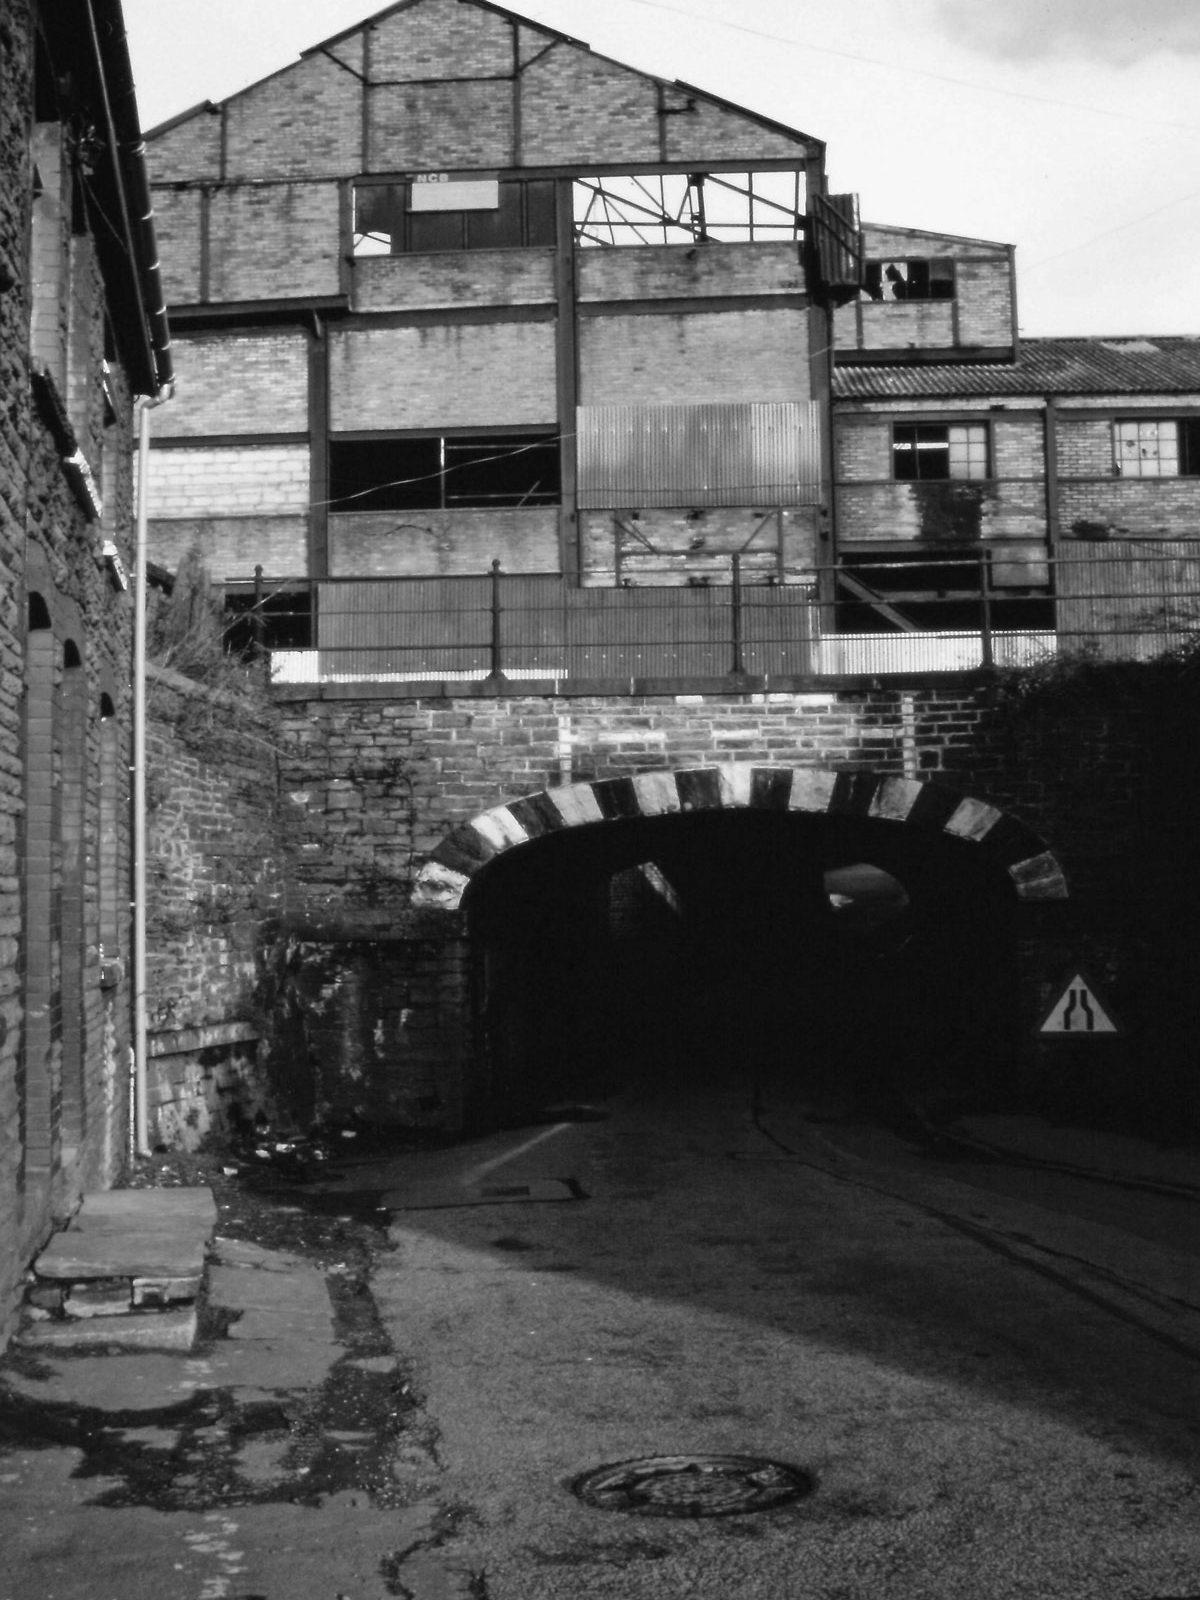 Demolition of the Lewis Merthyr Colliery at Trehafod